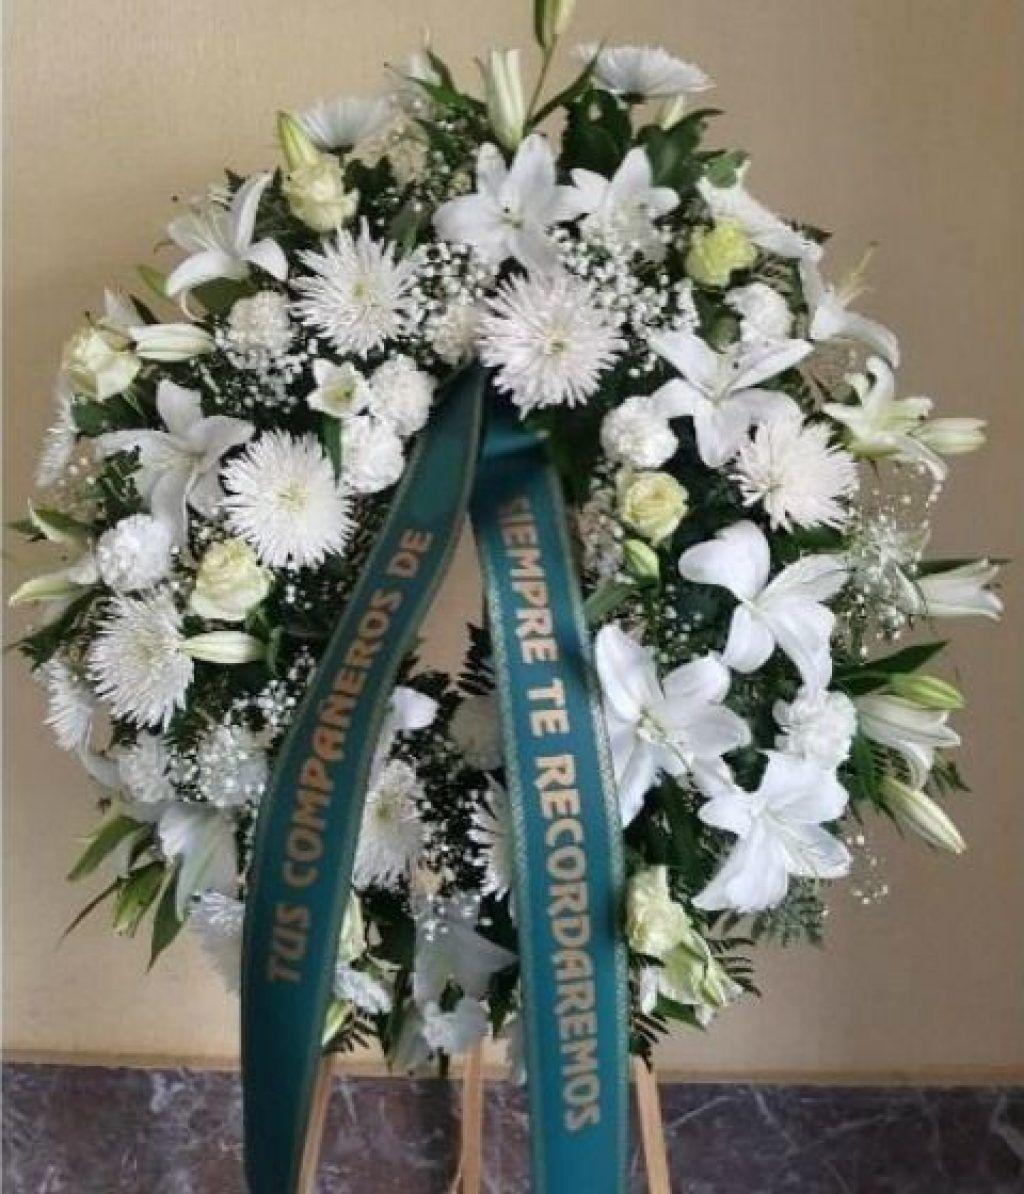 Corona Funeraria Madrid Arreglos Florales Funeral